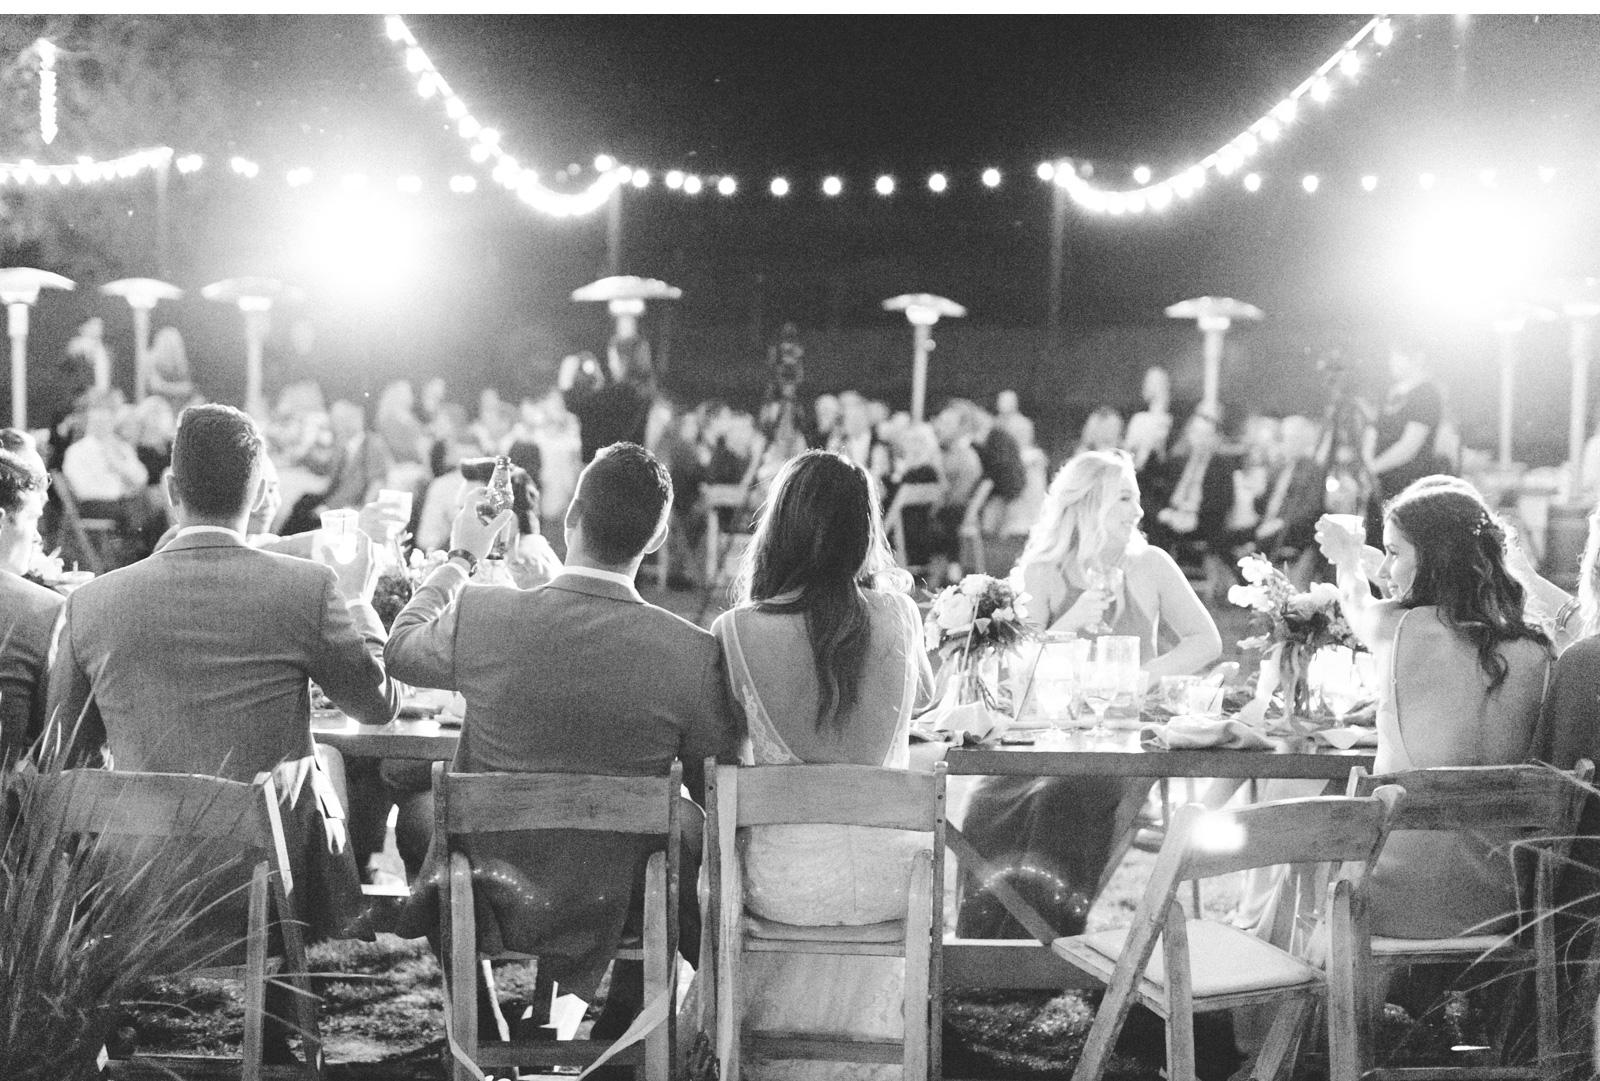 Triunfo-Creek-Malibu-Wedding-Photographer-Natalie-Schutt-Photography_06.jpg